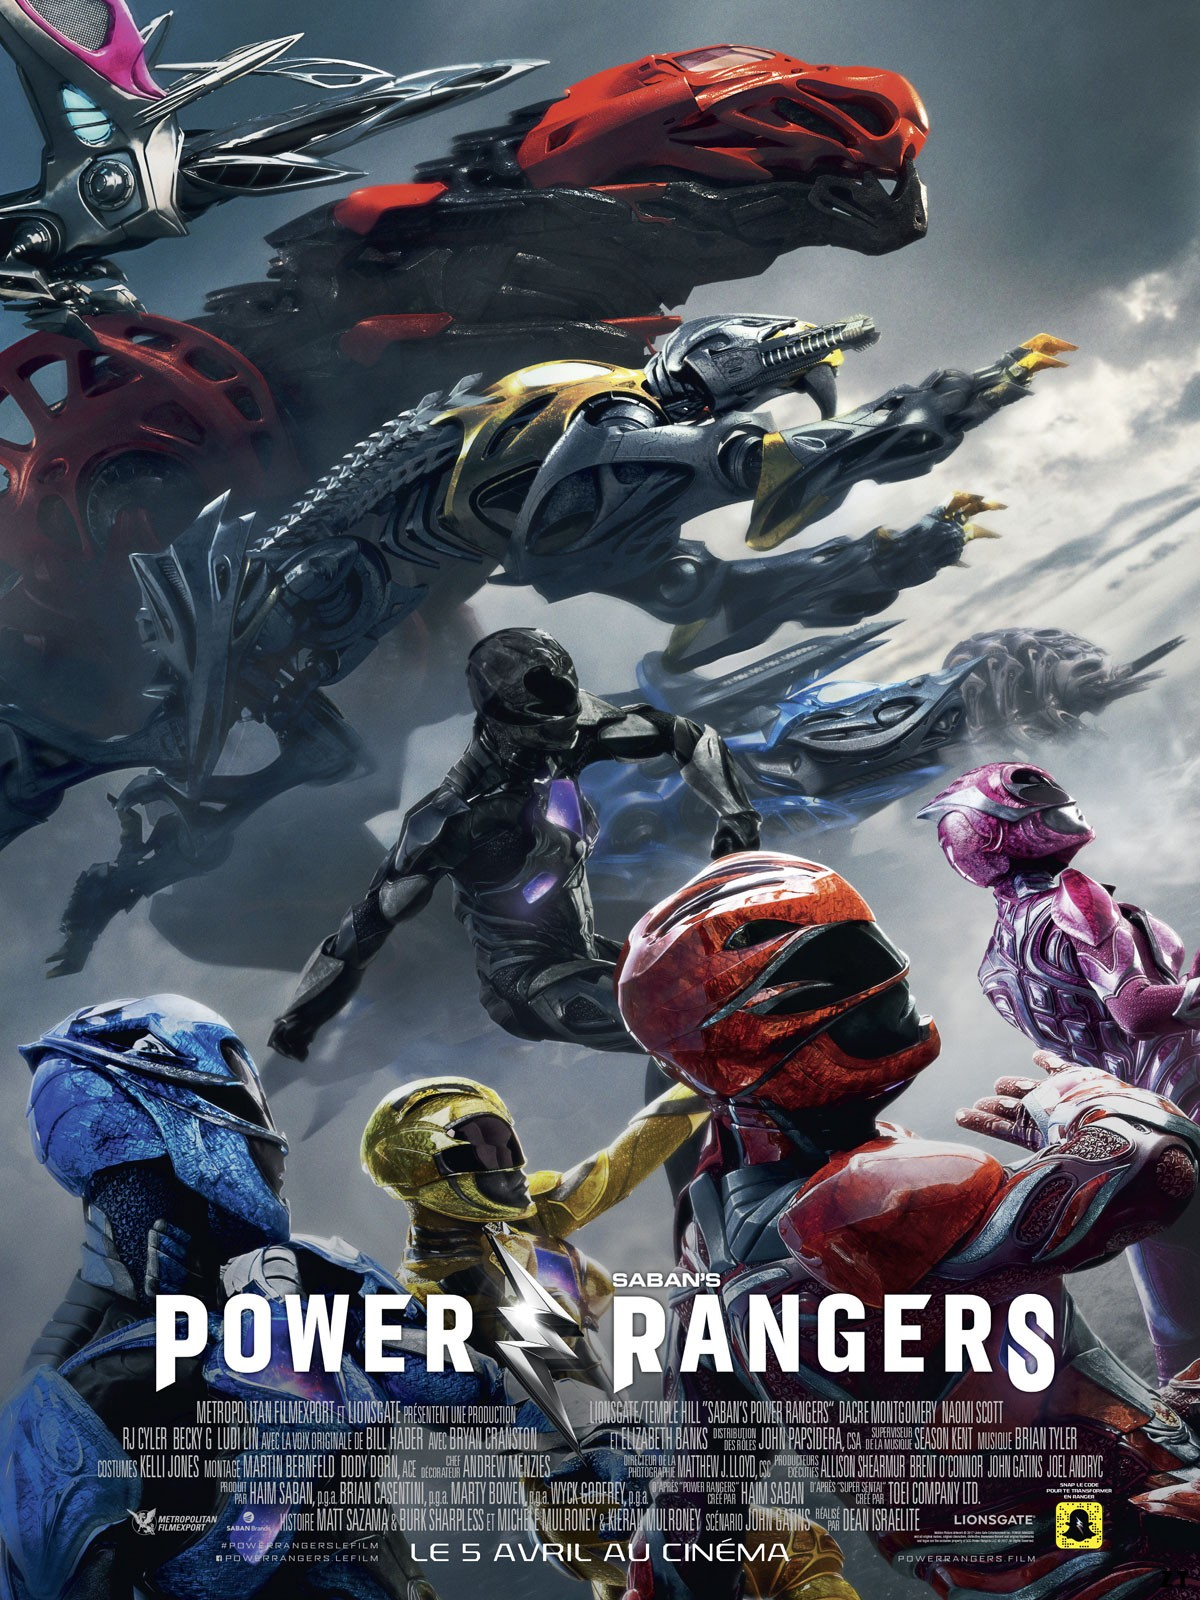 Power Rangers TRUEFRENCH DVDRIP 2017